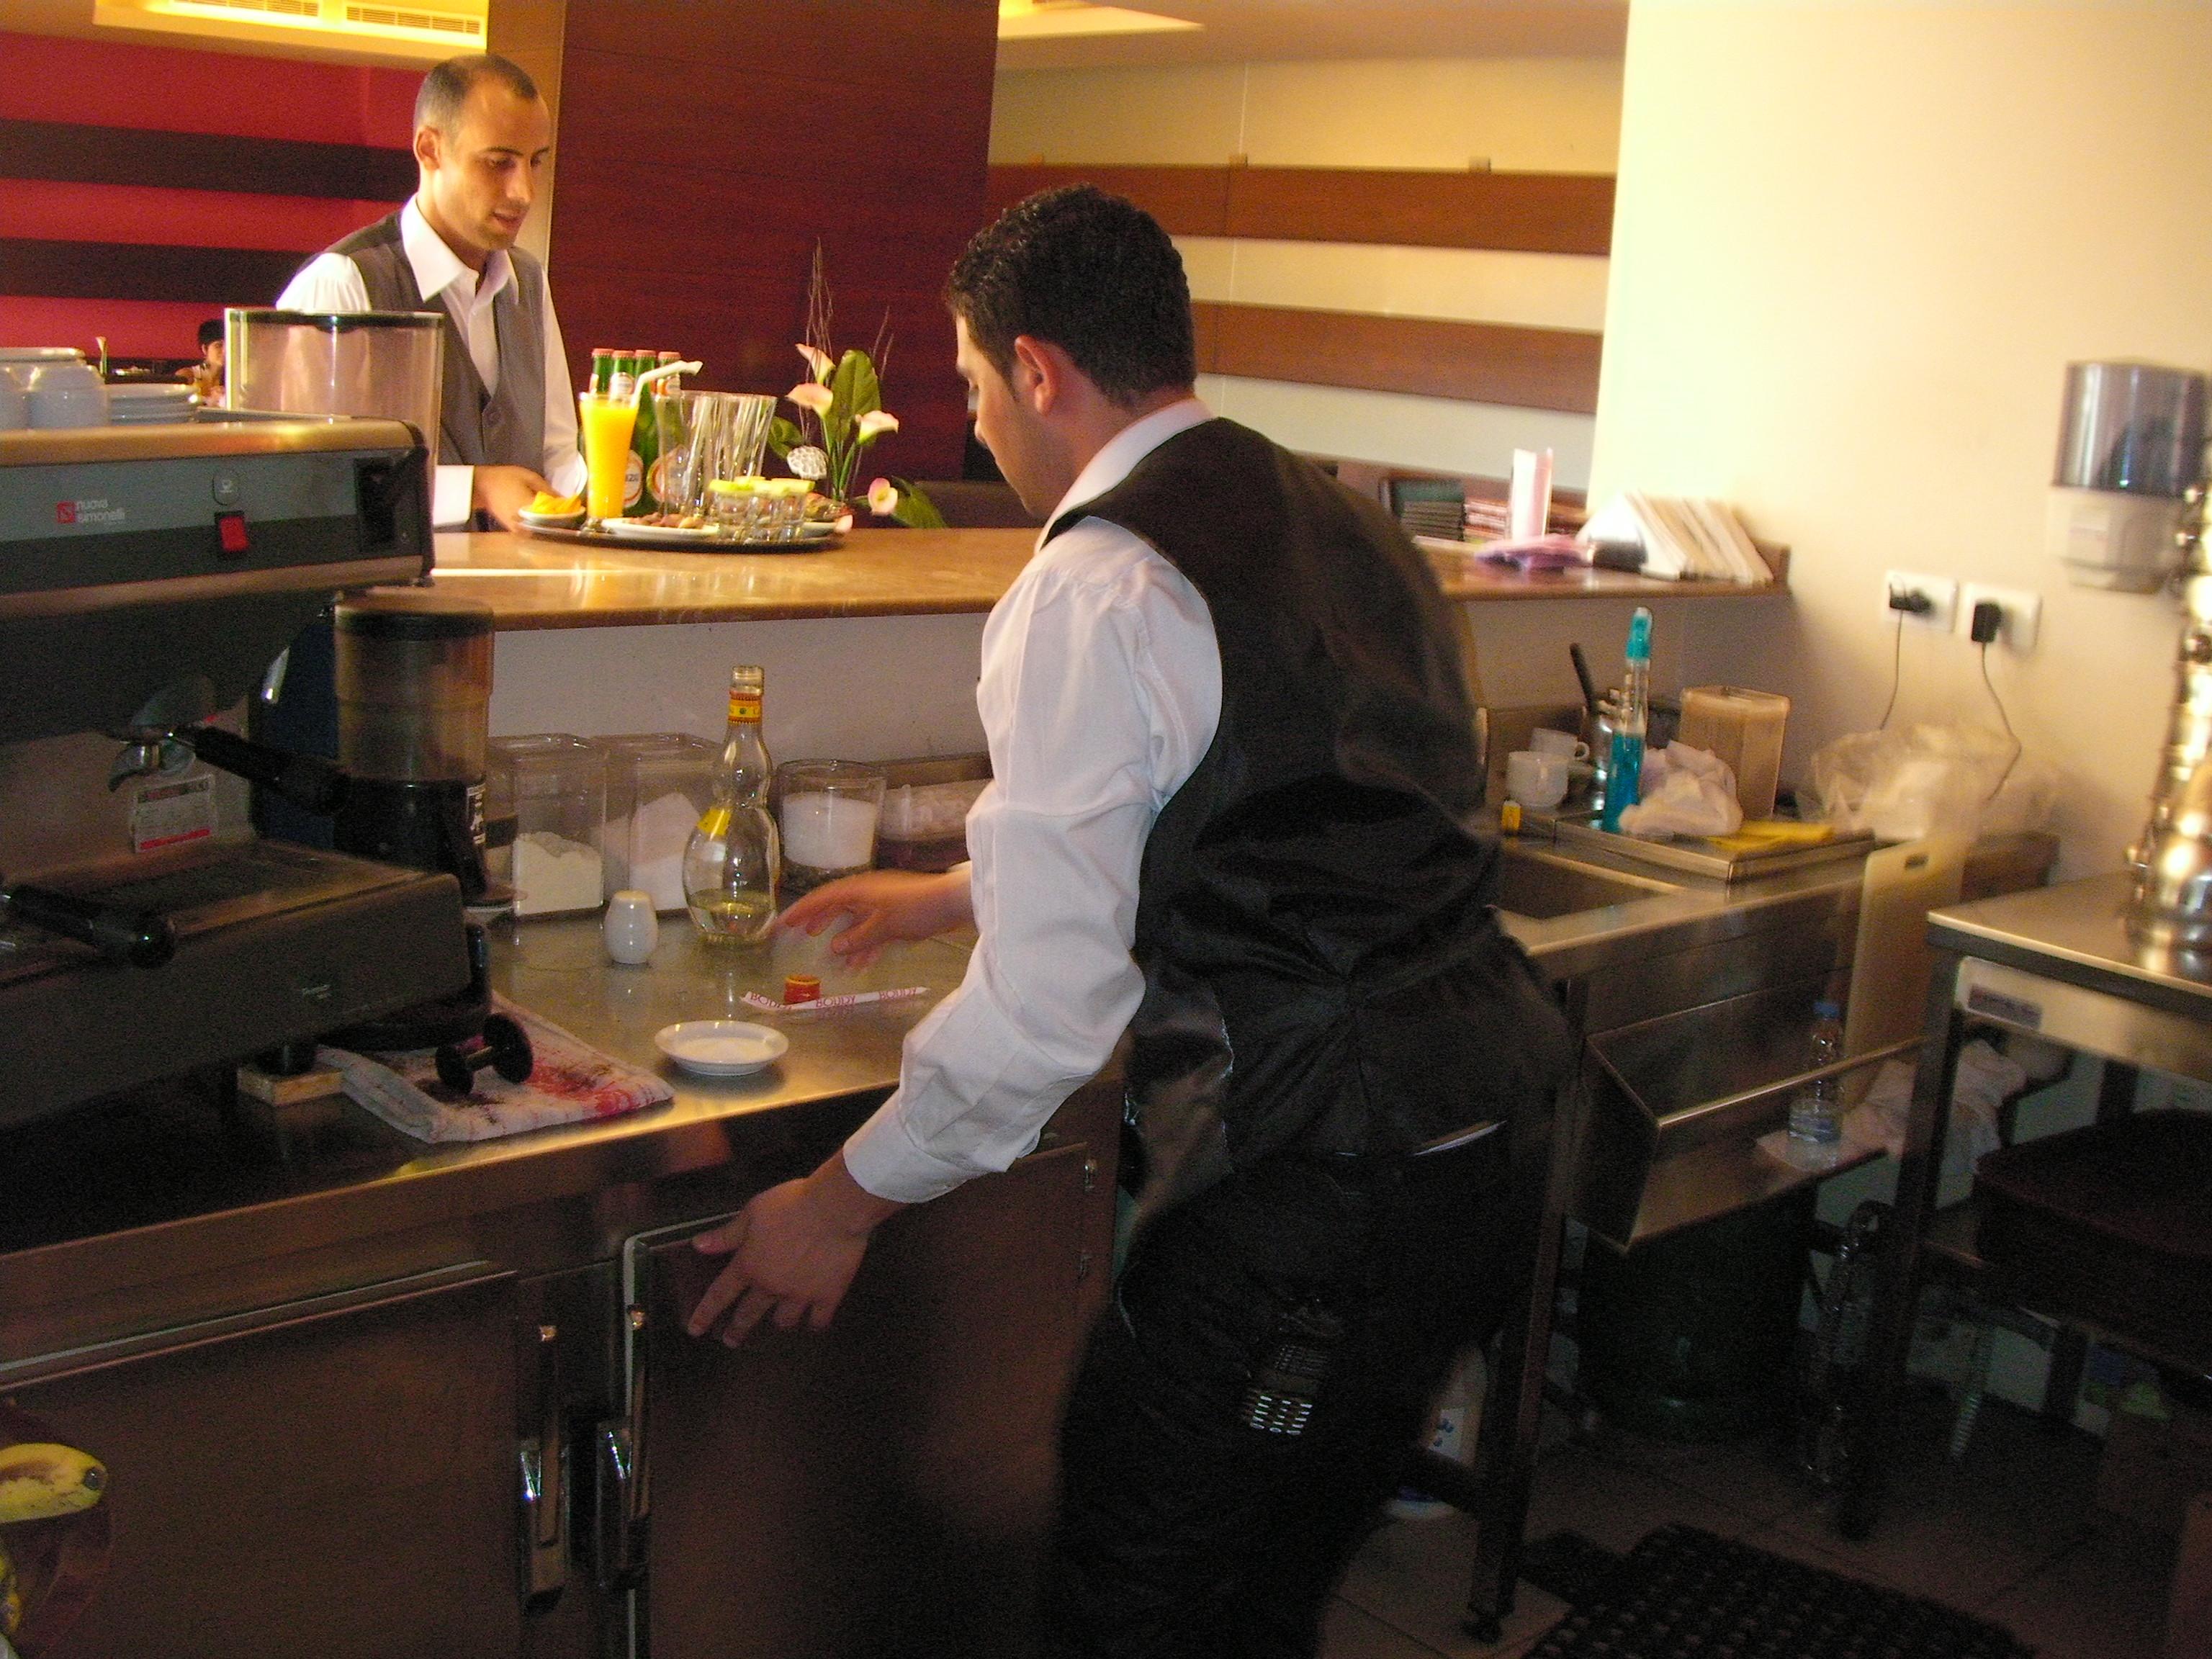 Hotel Romance Lebanon Kitchen Amp Pub Signed By Ipec Ipec